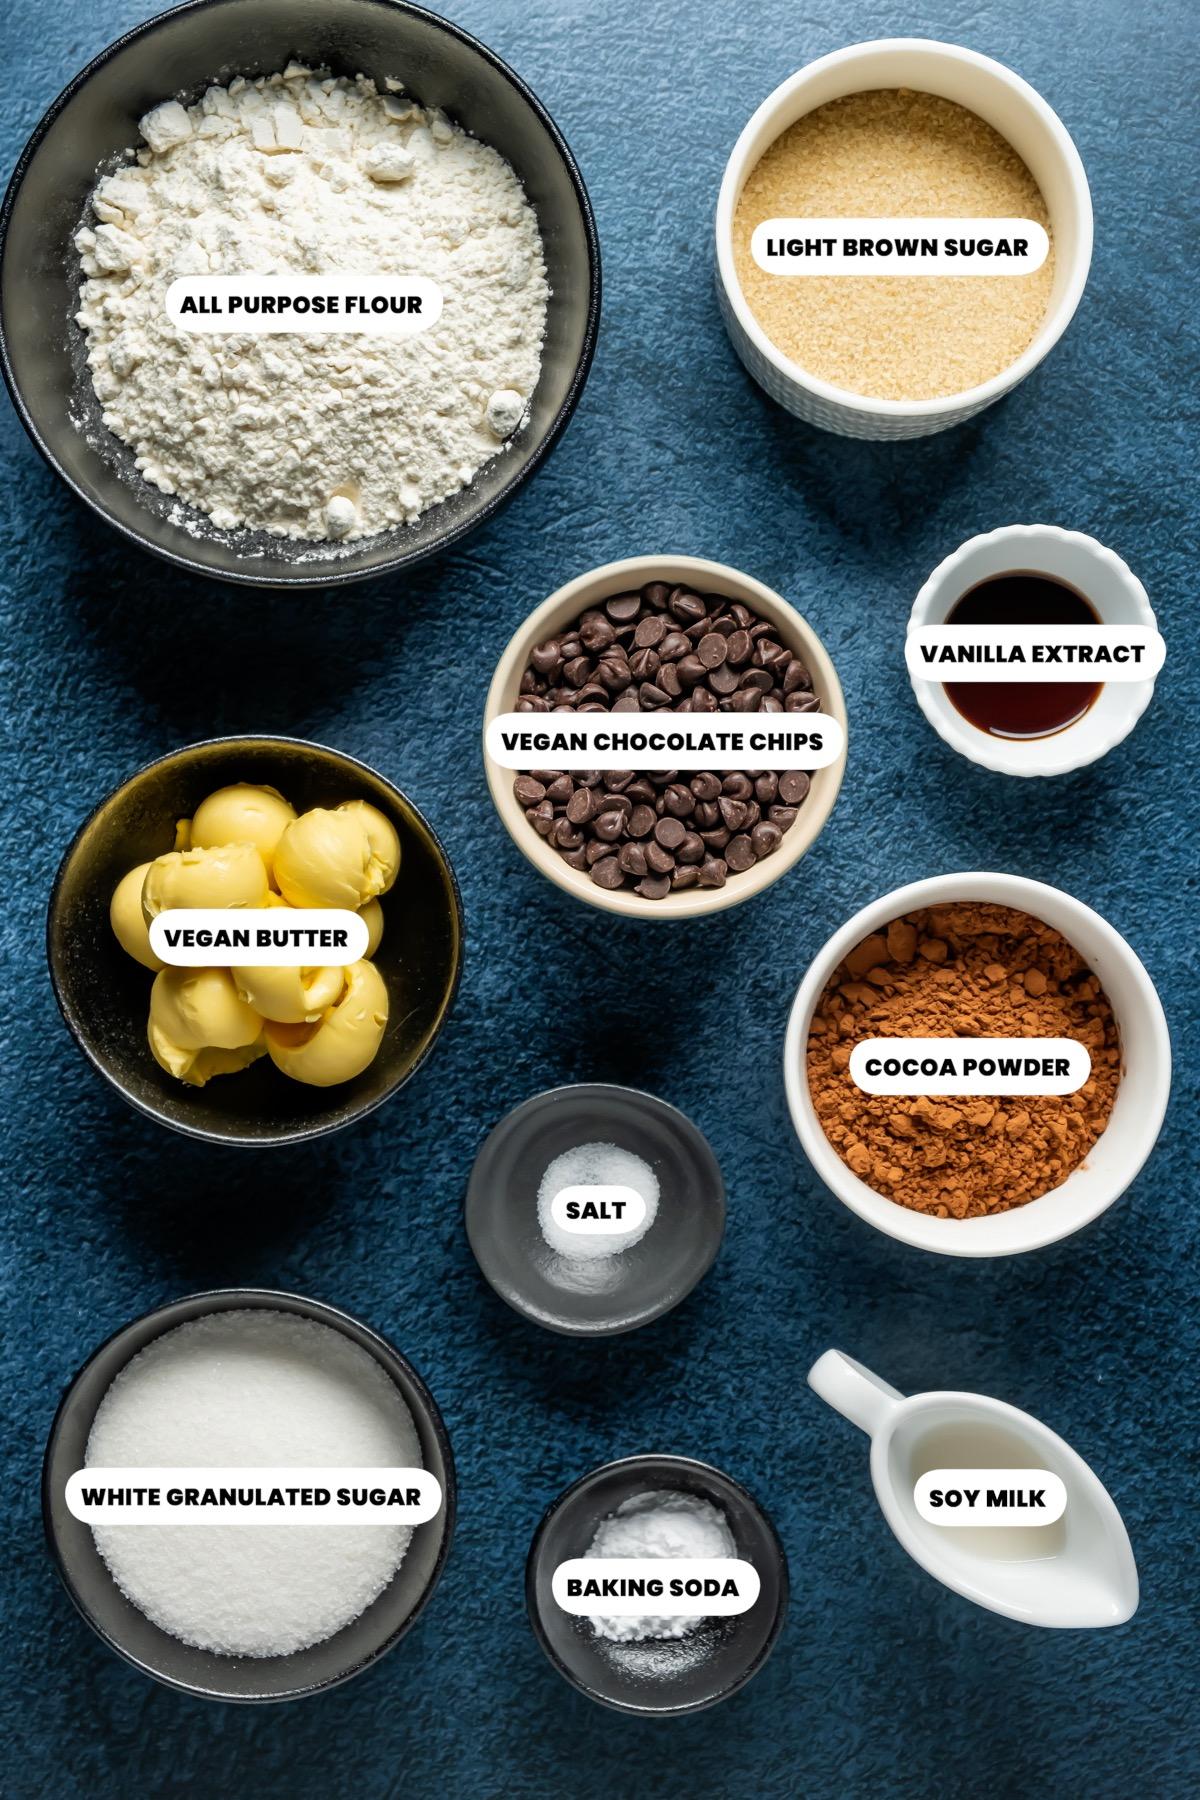 Photo of the ingredients needed to make vegan chocolate cookies.